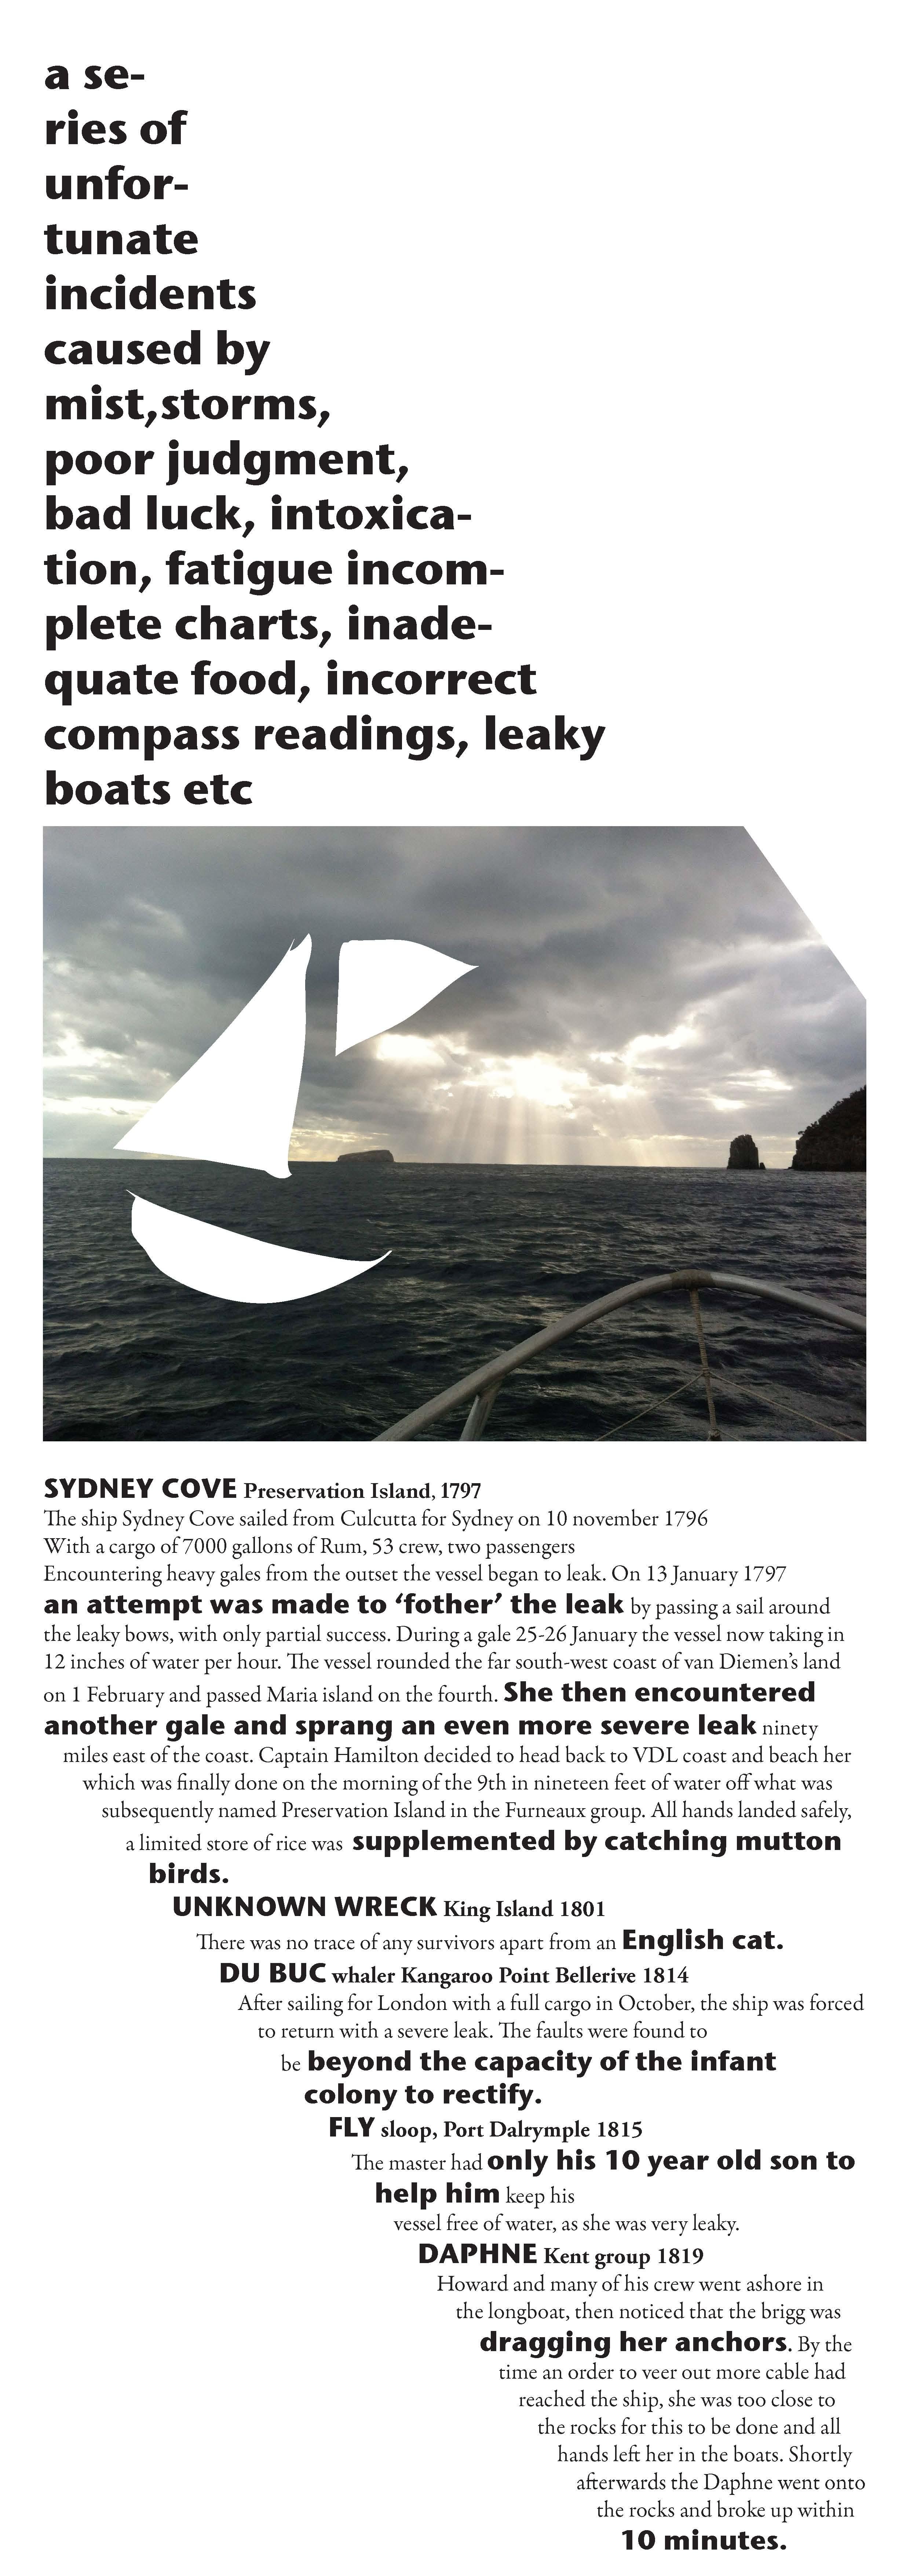 Shipwrecks of Tasmania Exhibition